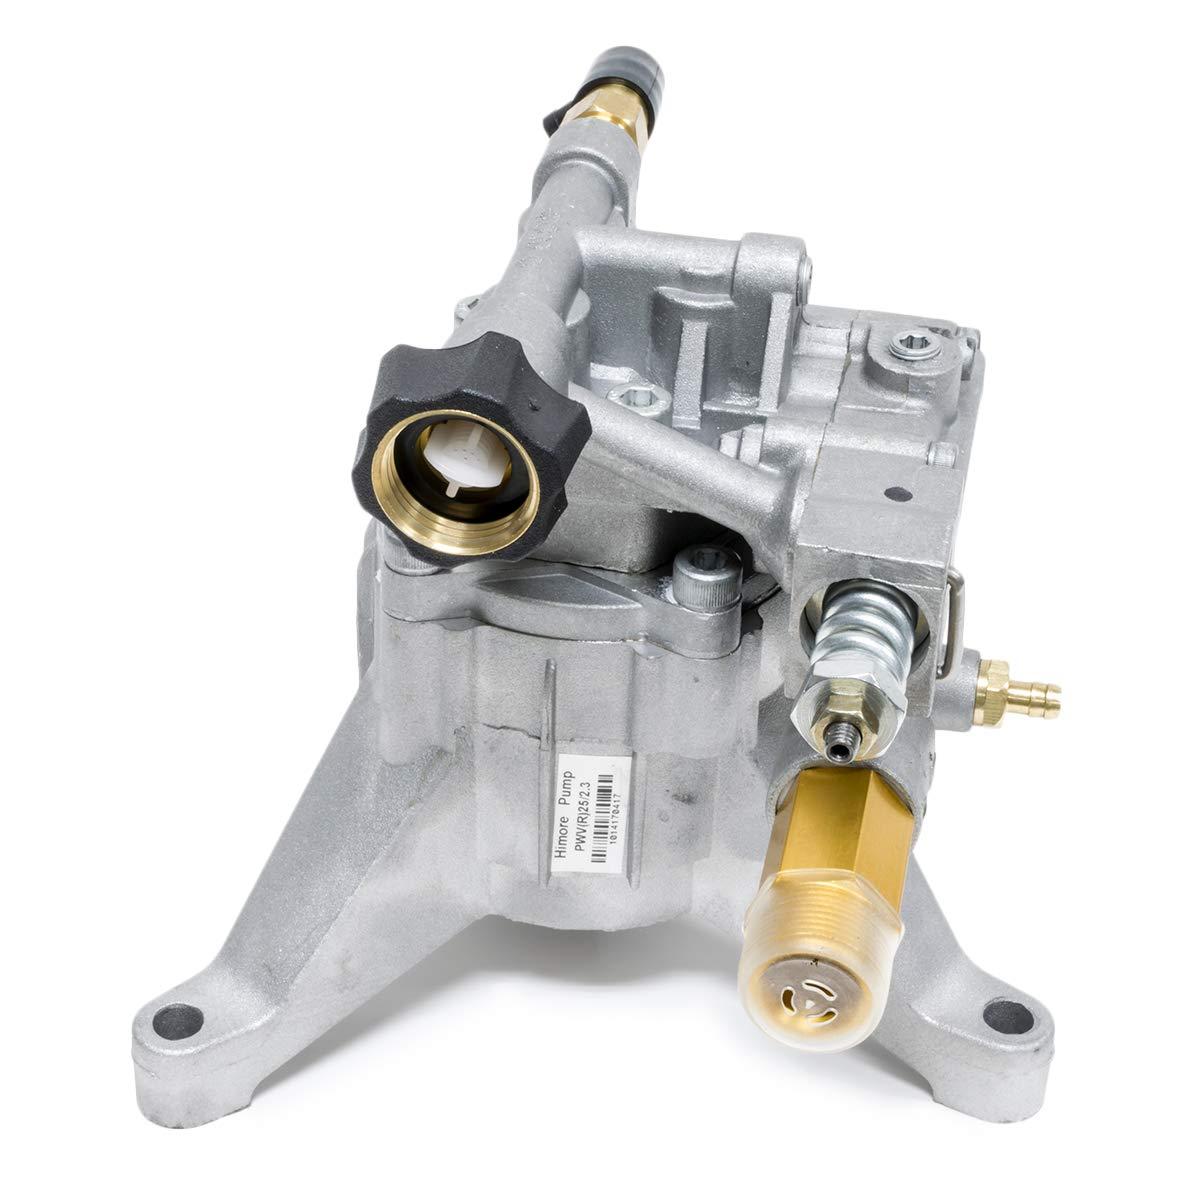 2700 PSI Pressure Washer Water Pump for Homelite UT80993 UT80993A